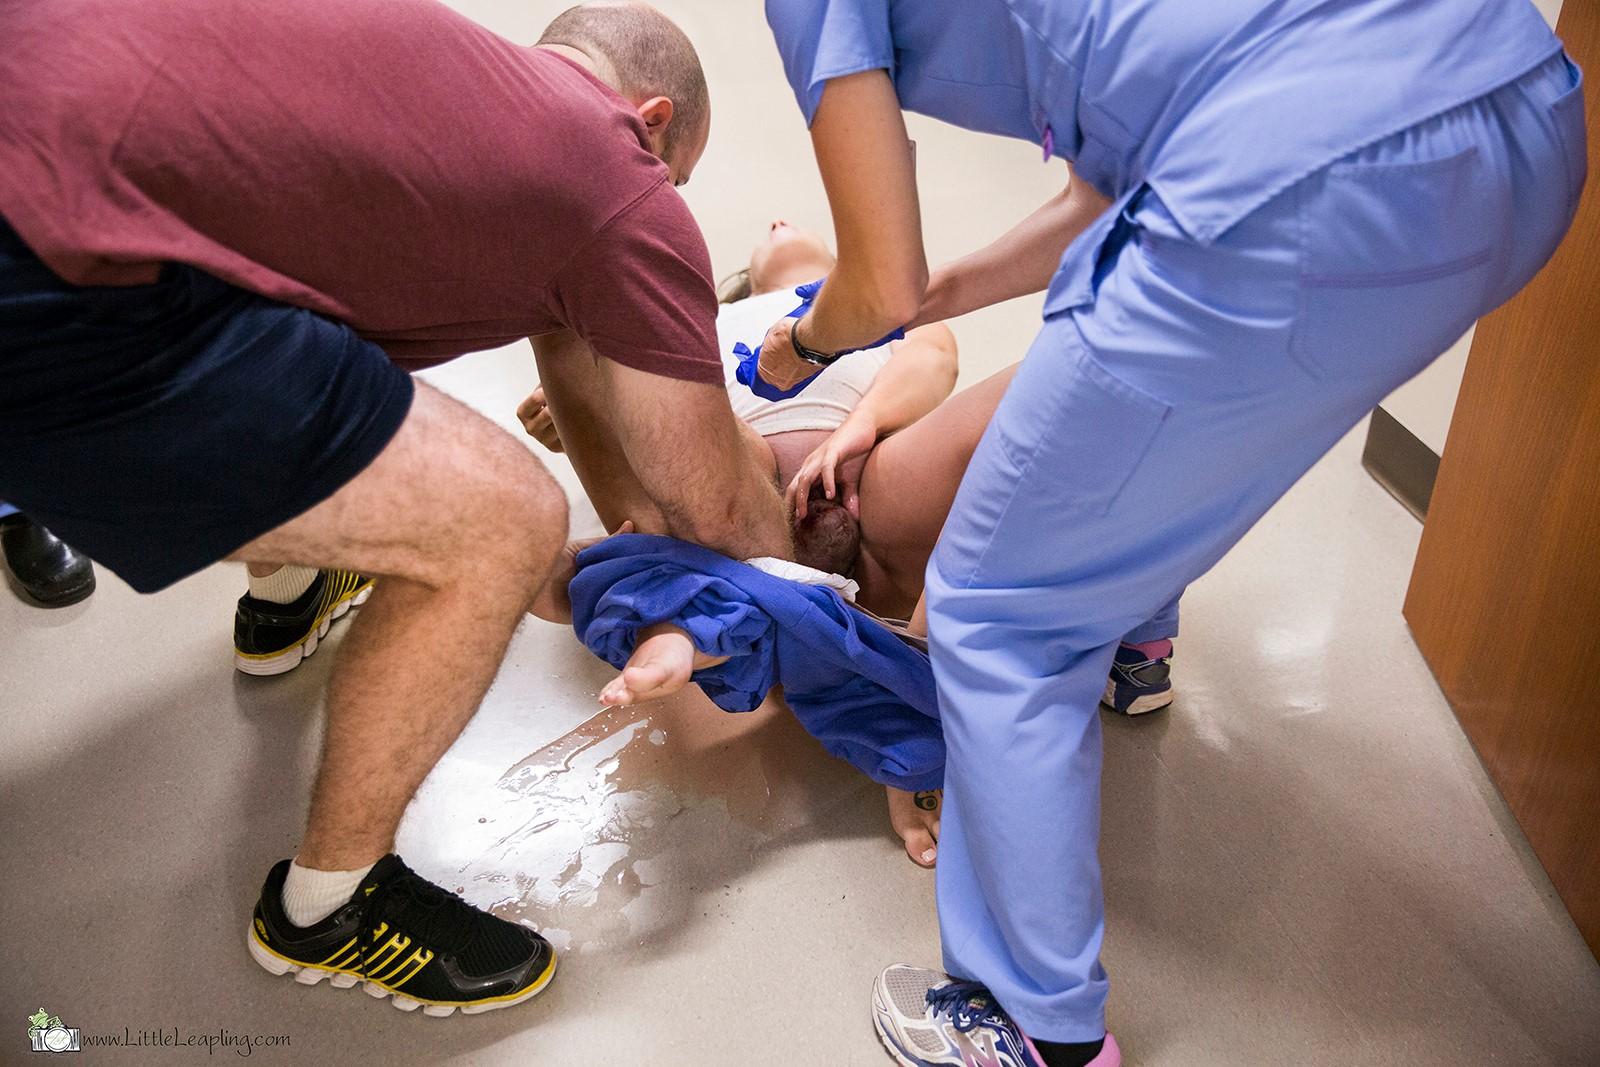 Foto nacimiento pasillo urgencias hospital 4